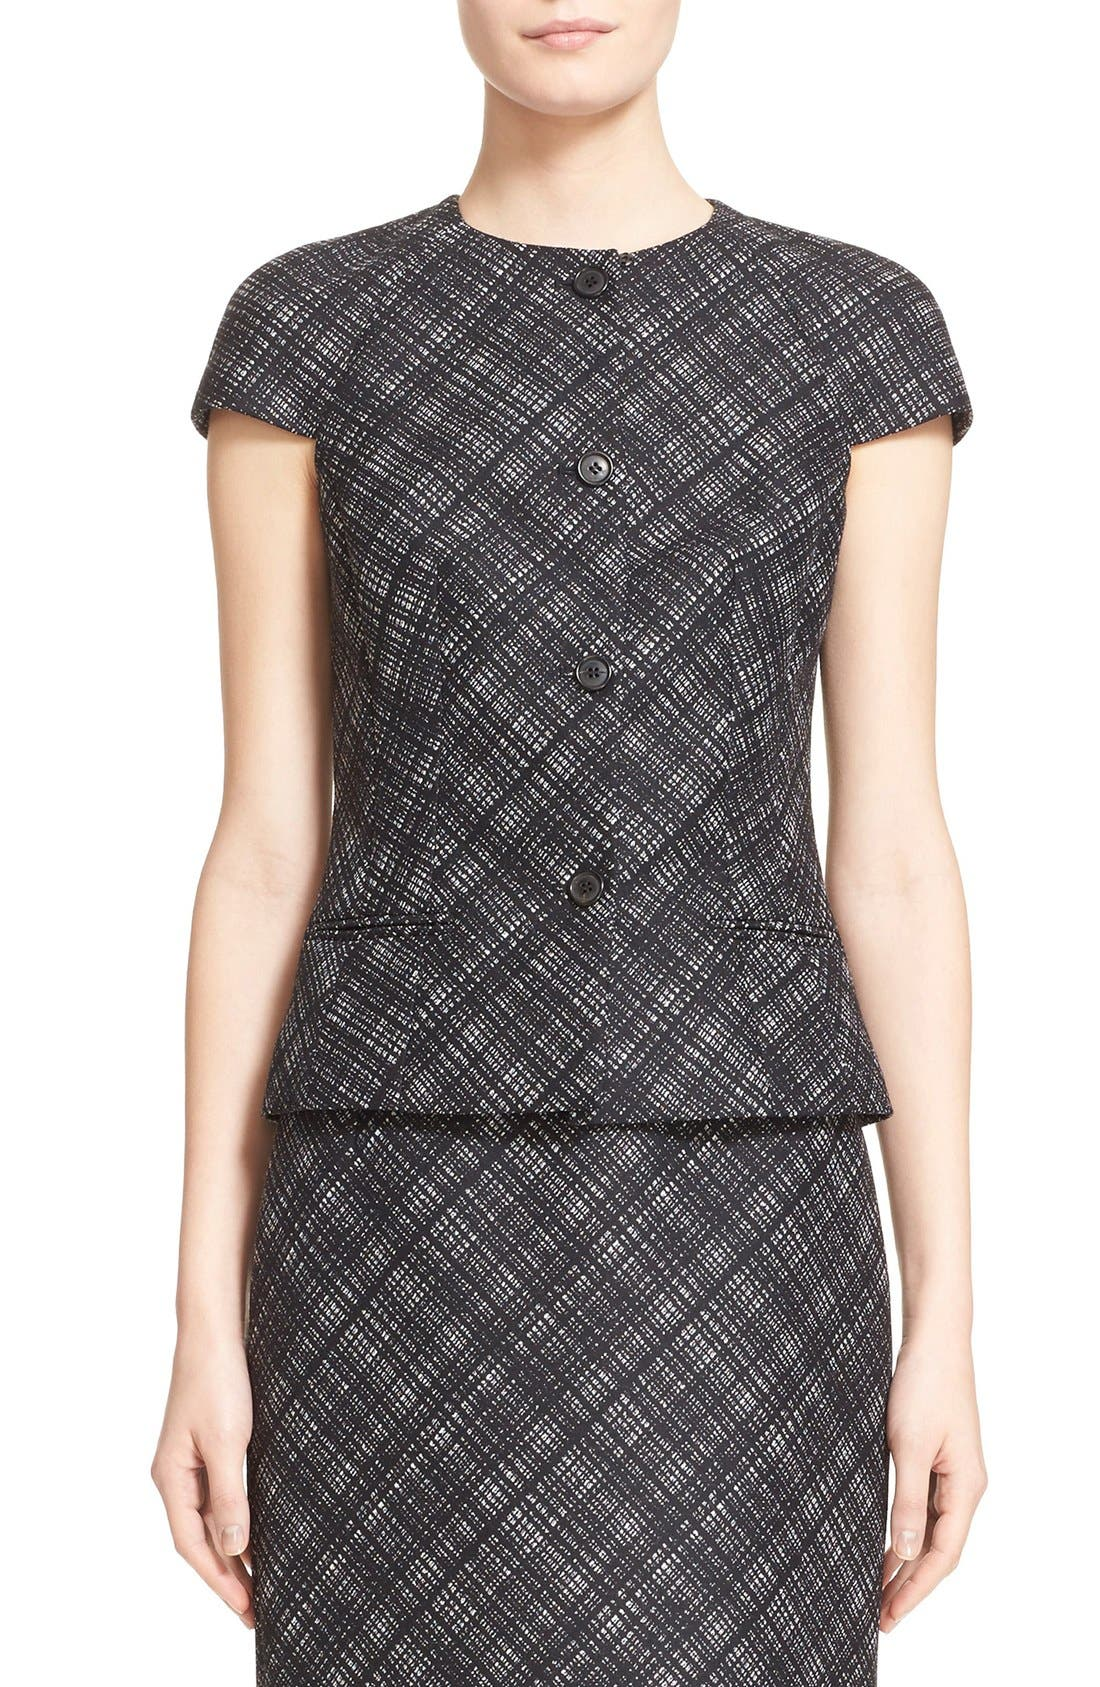 Main Image - Michael Kors Jacquard Plaid Cap Sleeve Wool Jacket